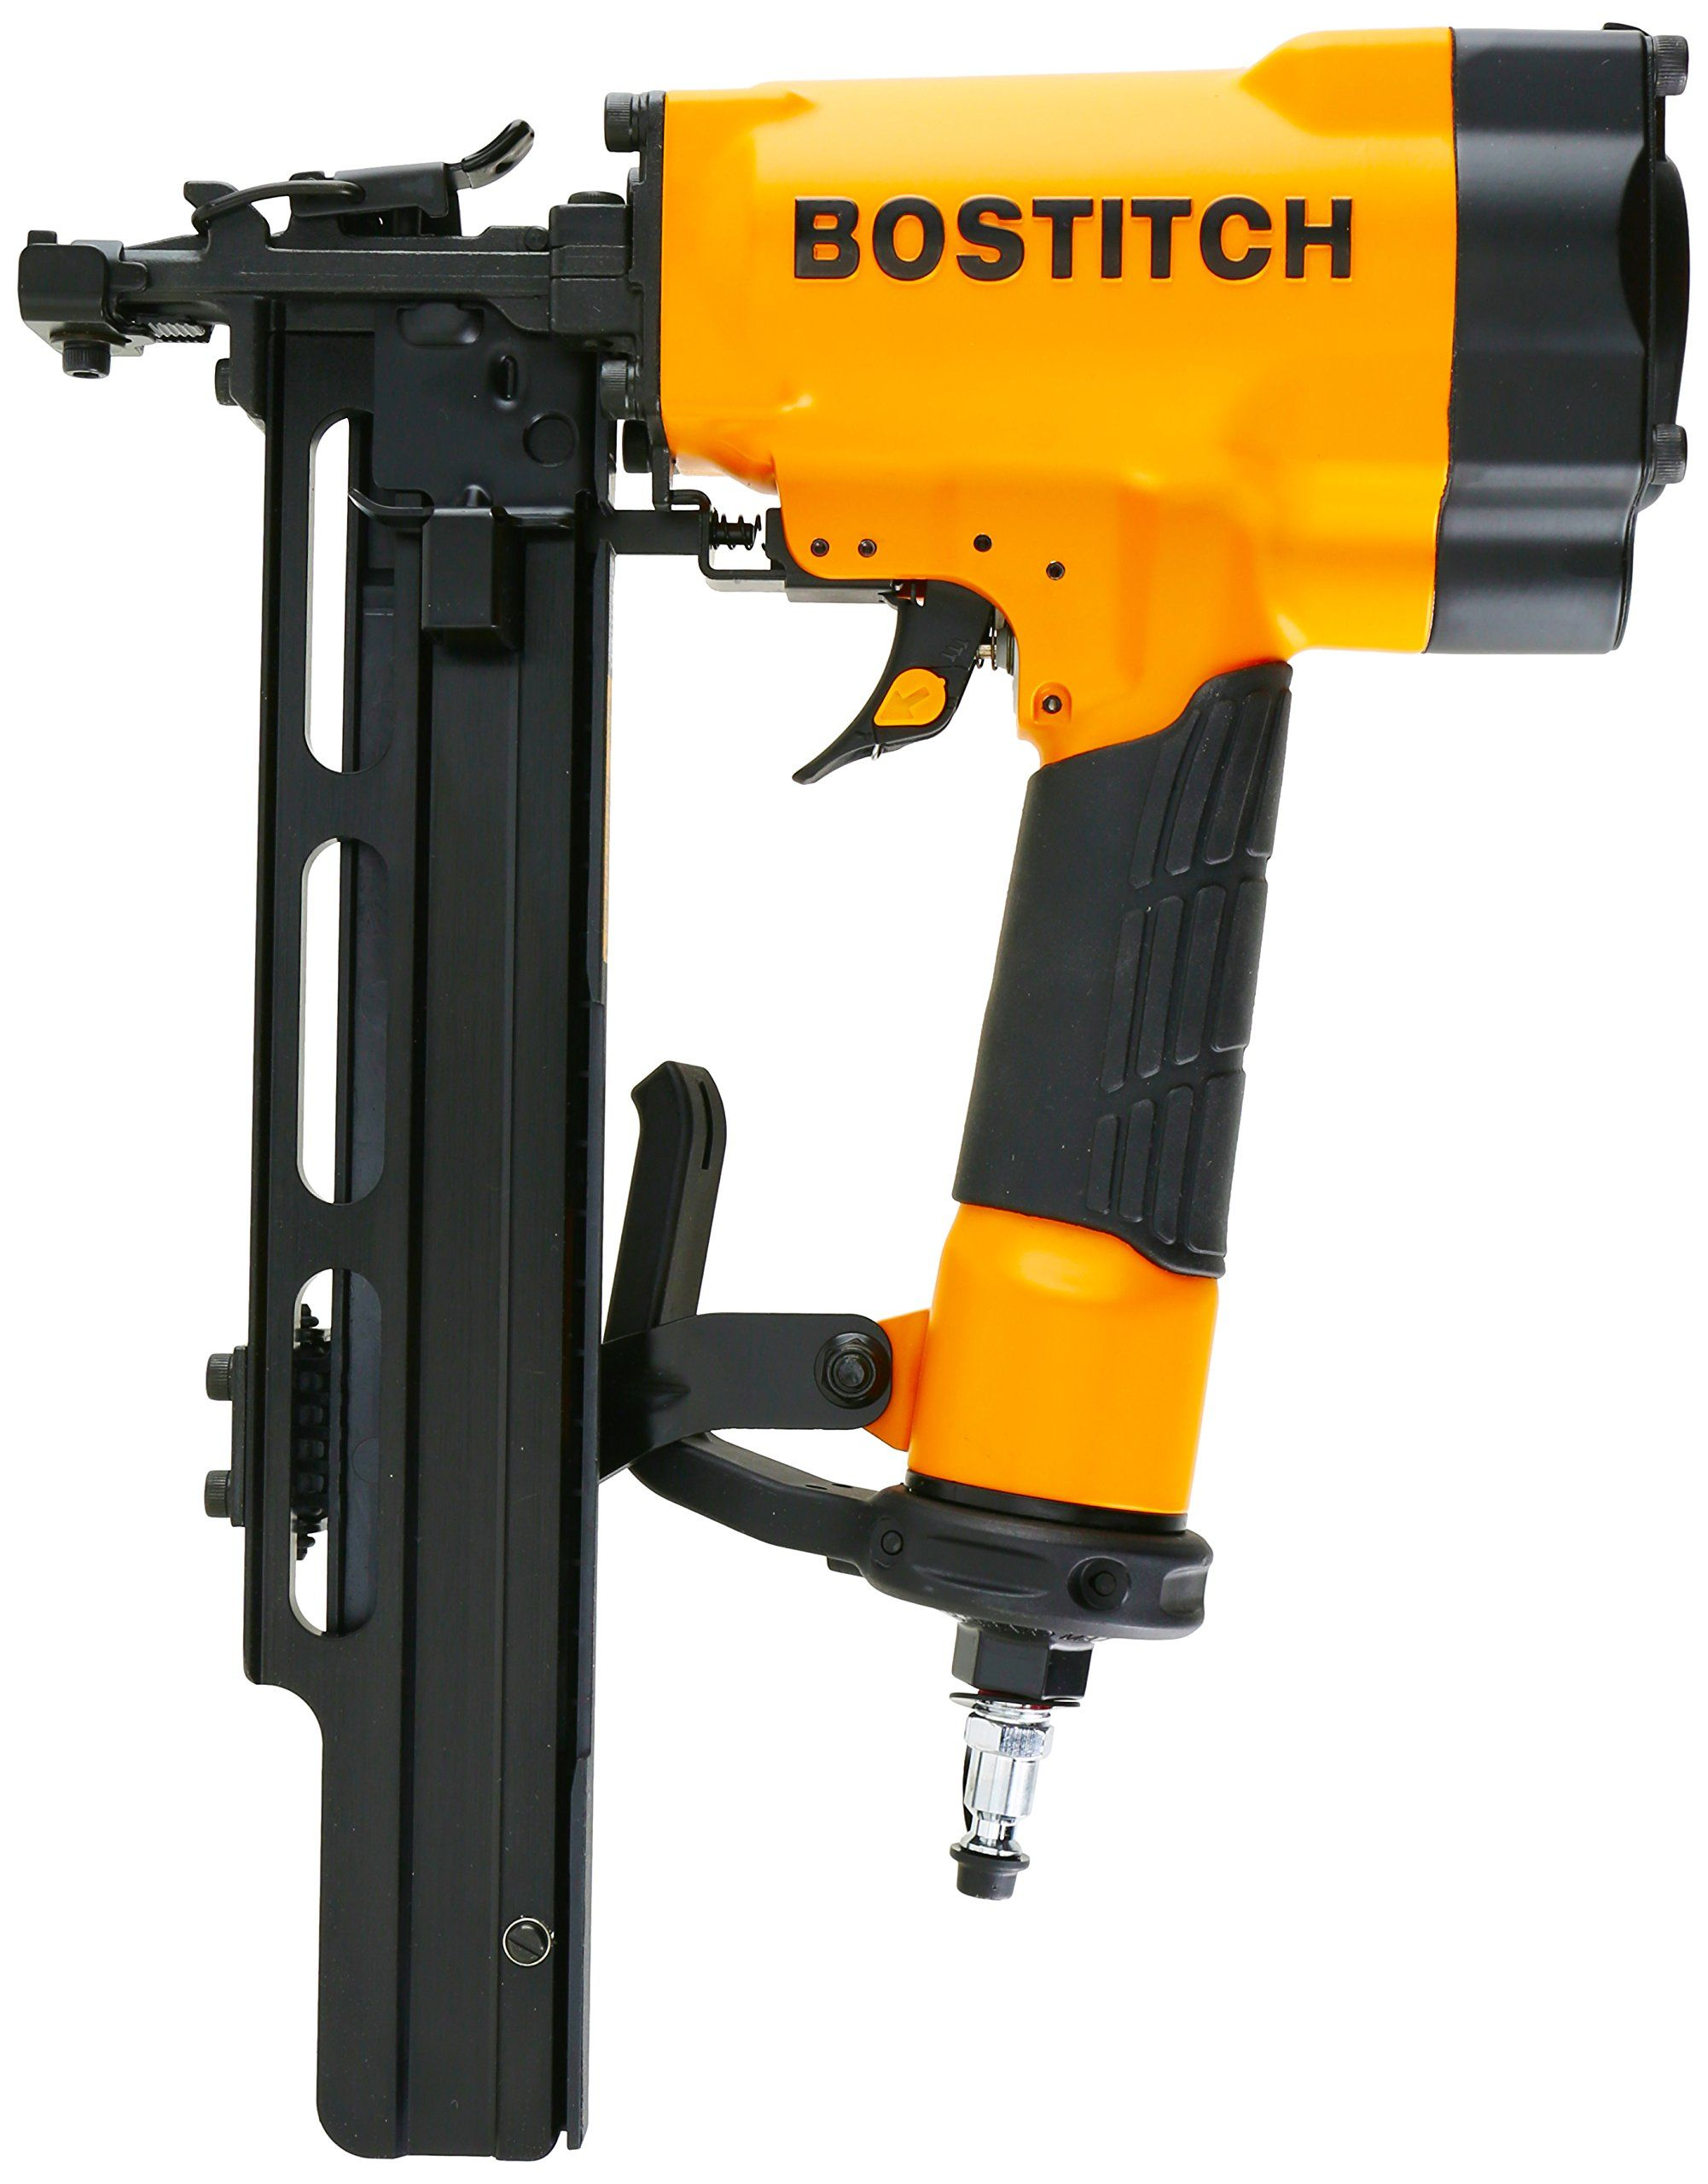 Bostitch 651s5 7 16 Inch By 2 Inch Stapler Ad Bostitch Affiliate Stapler Inch Stapler Design Installing Siding Best Cordless Circular Saw